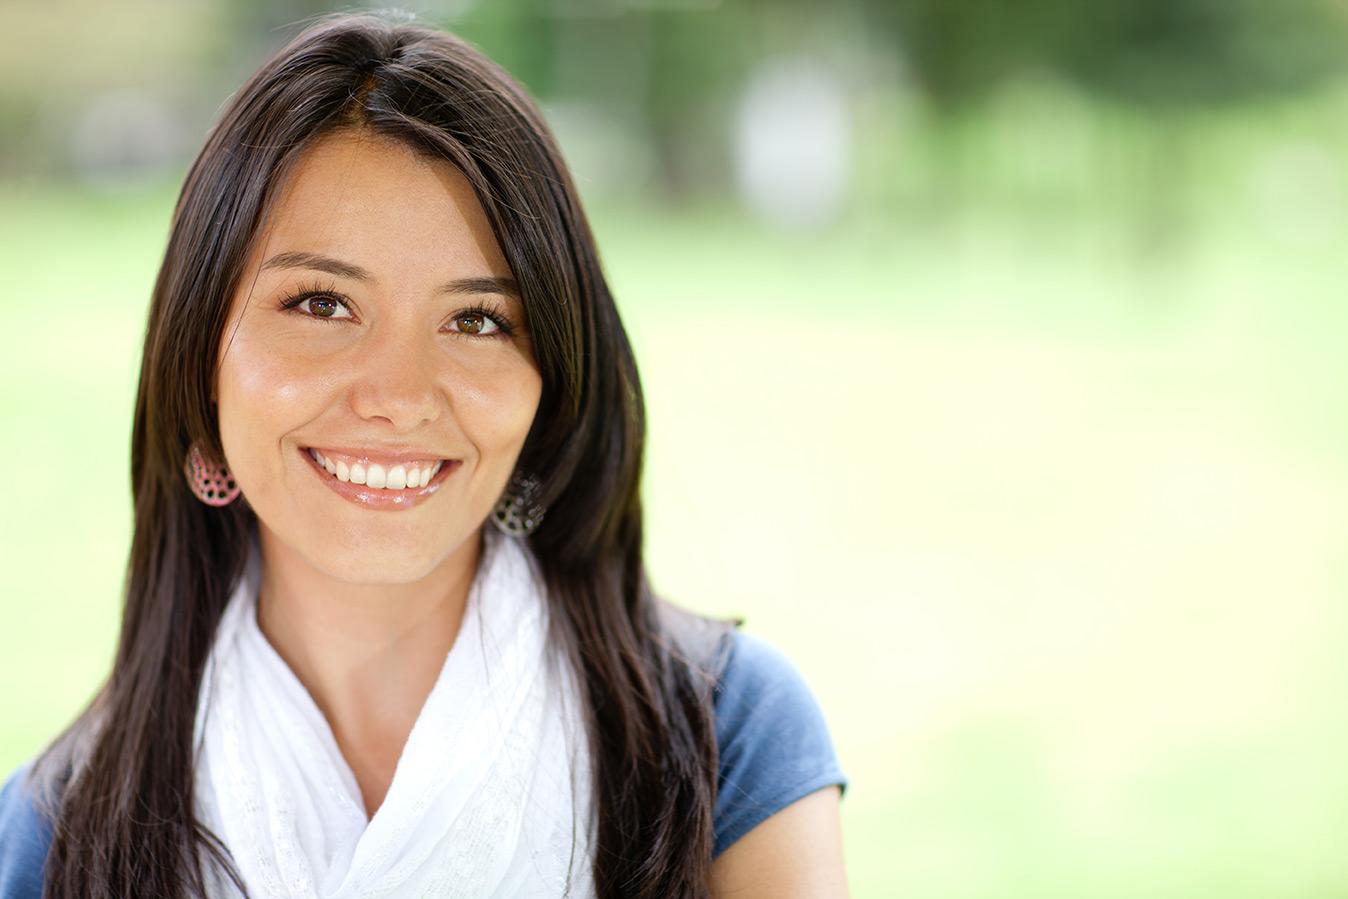 Woman-Birmingham-Dental-checkups